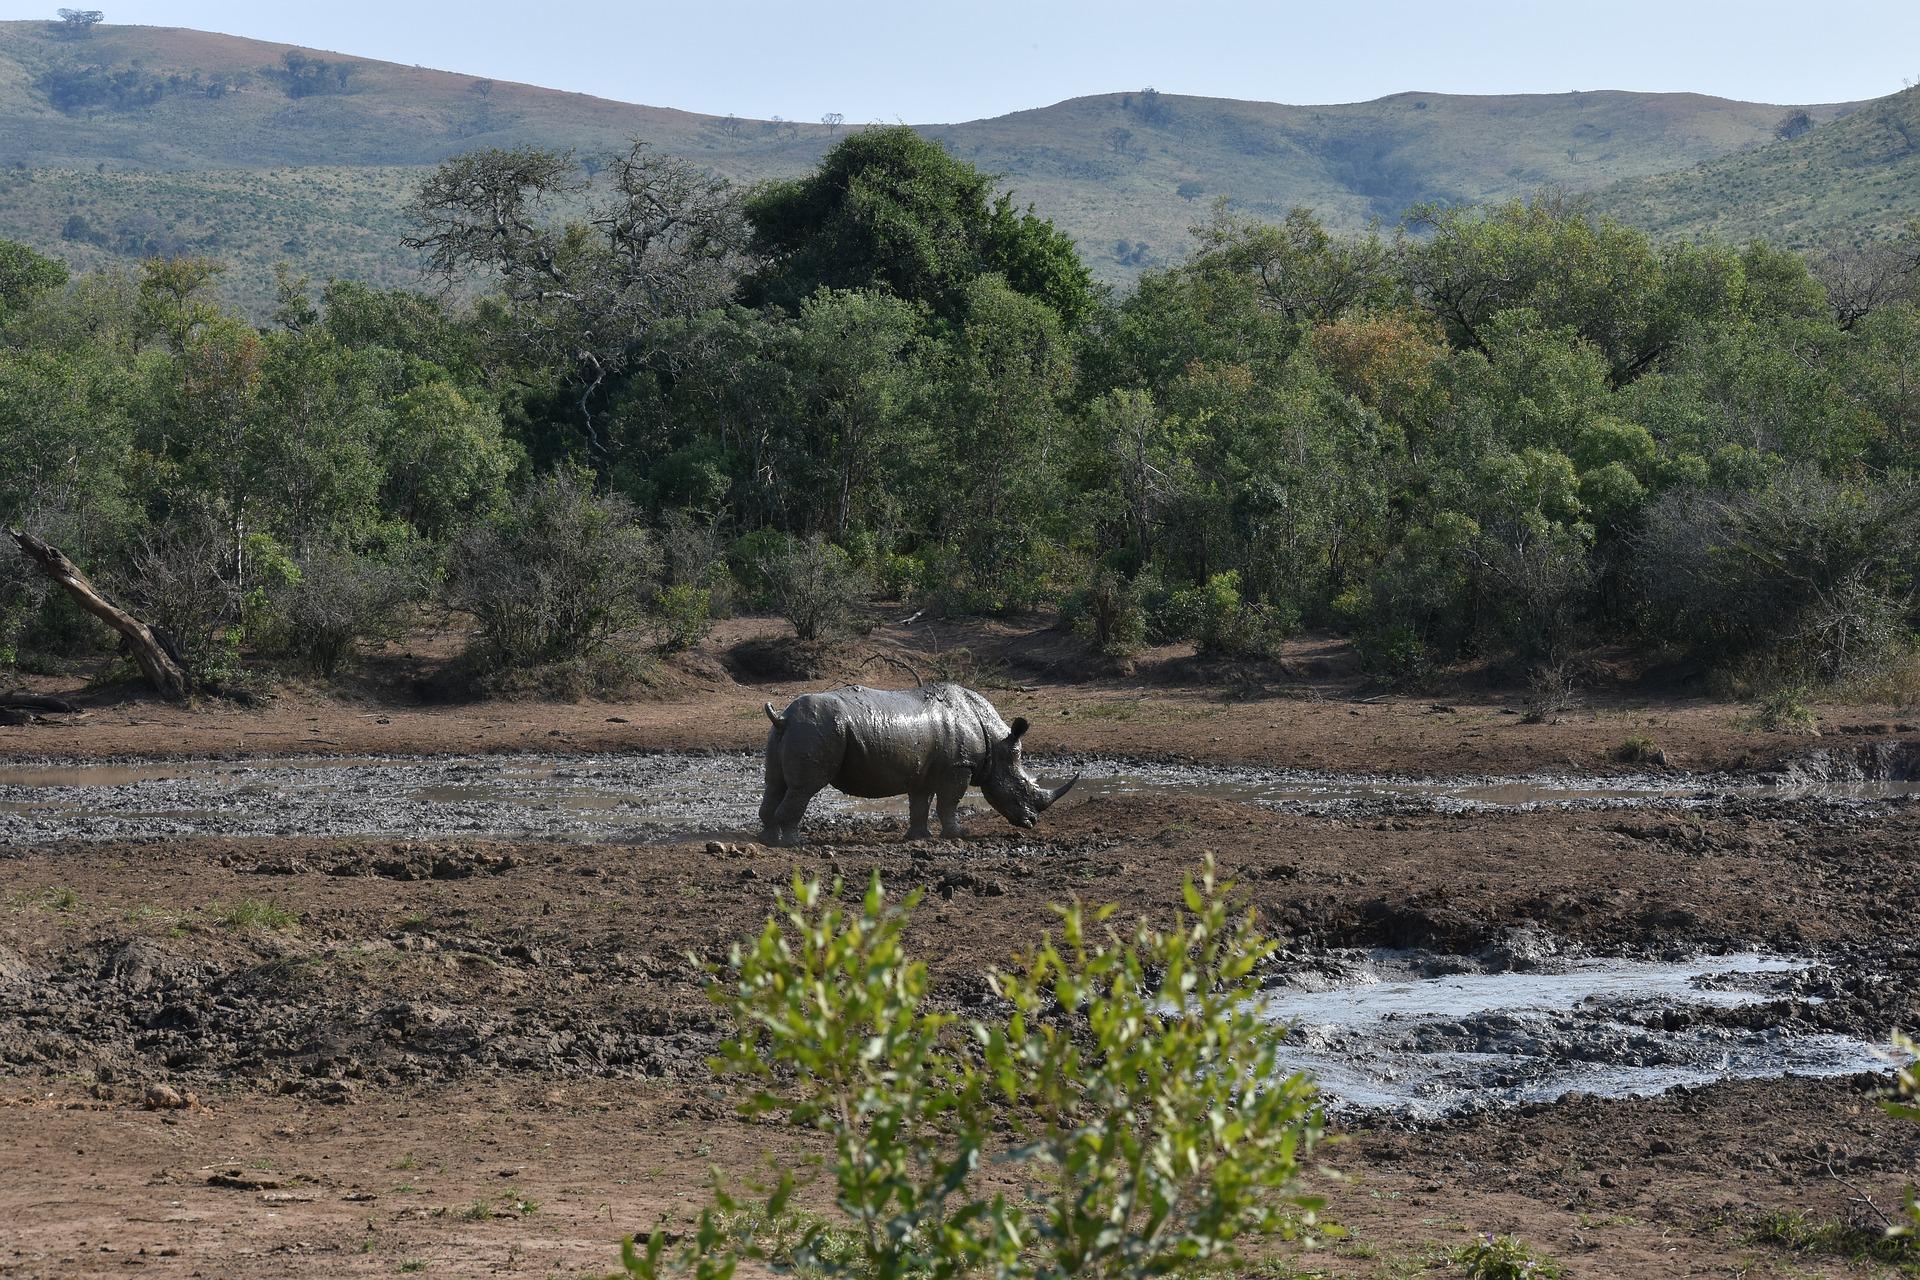 Black Rhino along a bank